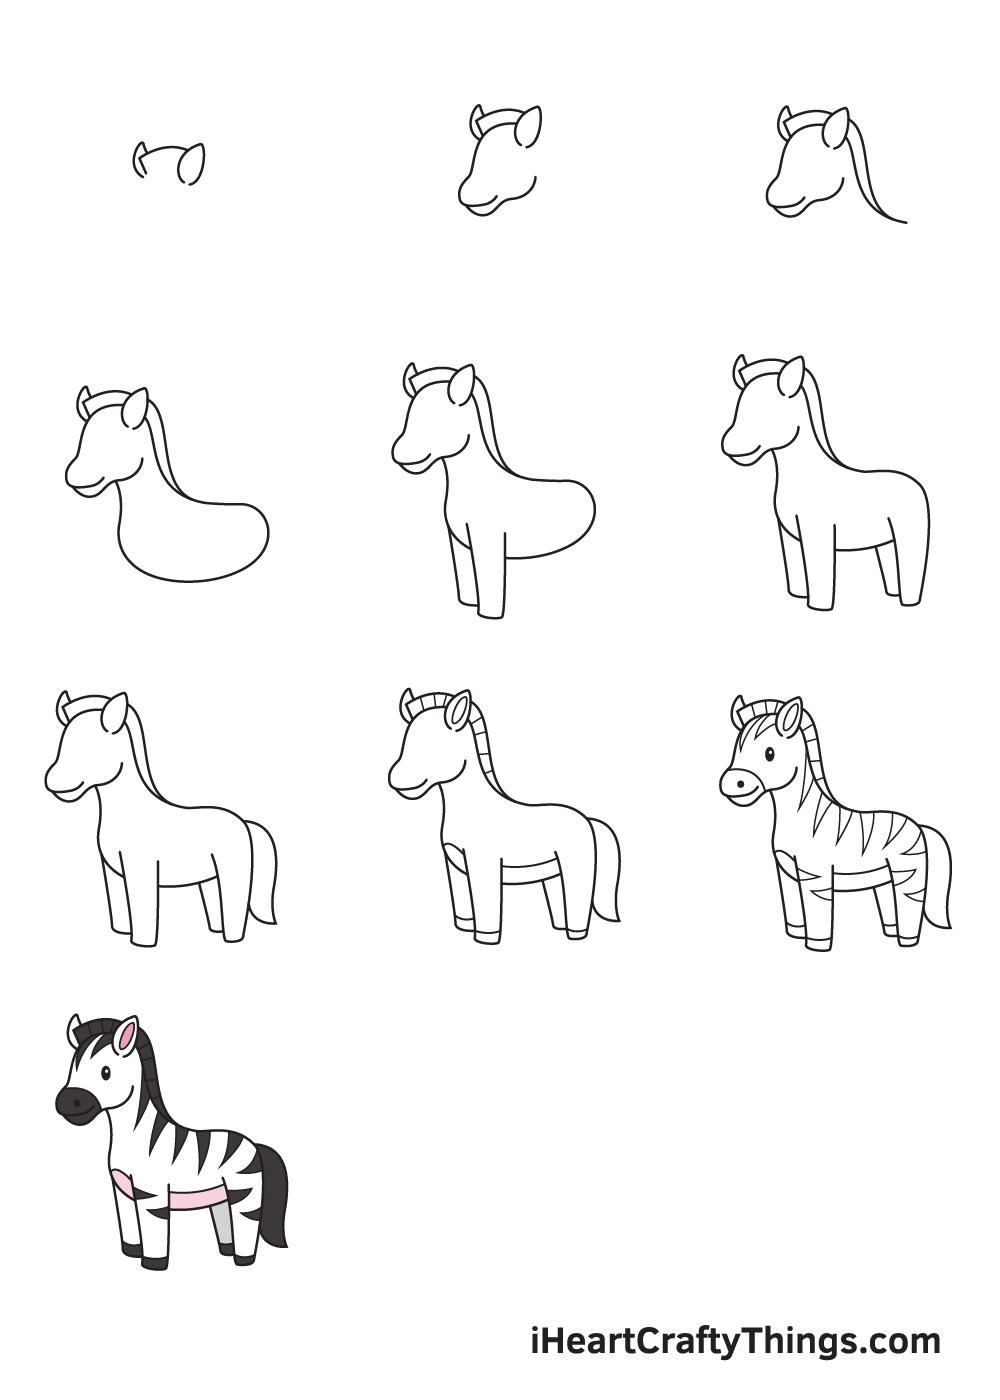 drawing zebra in 9 easy steps